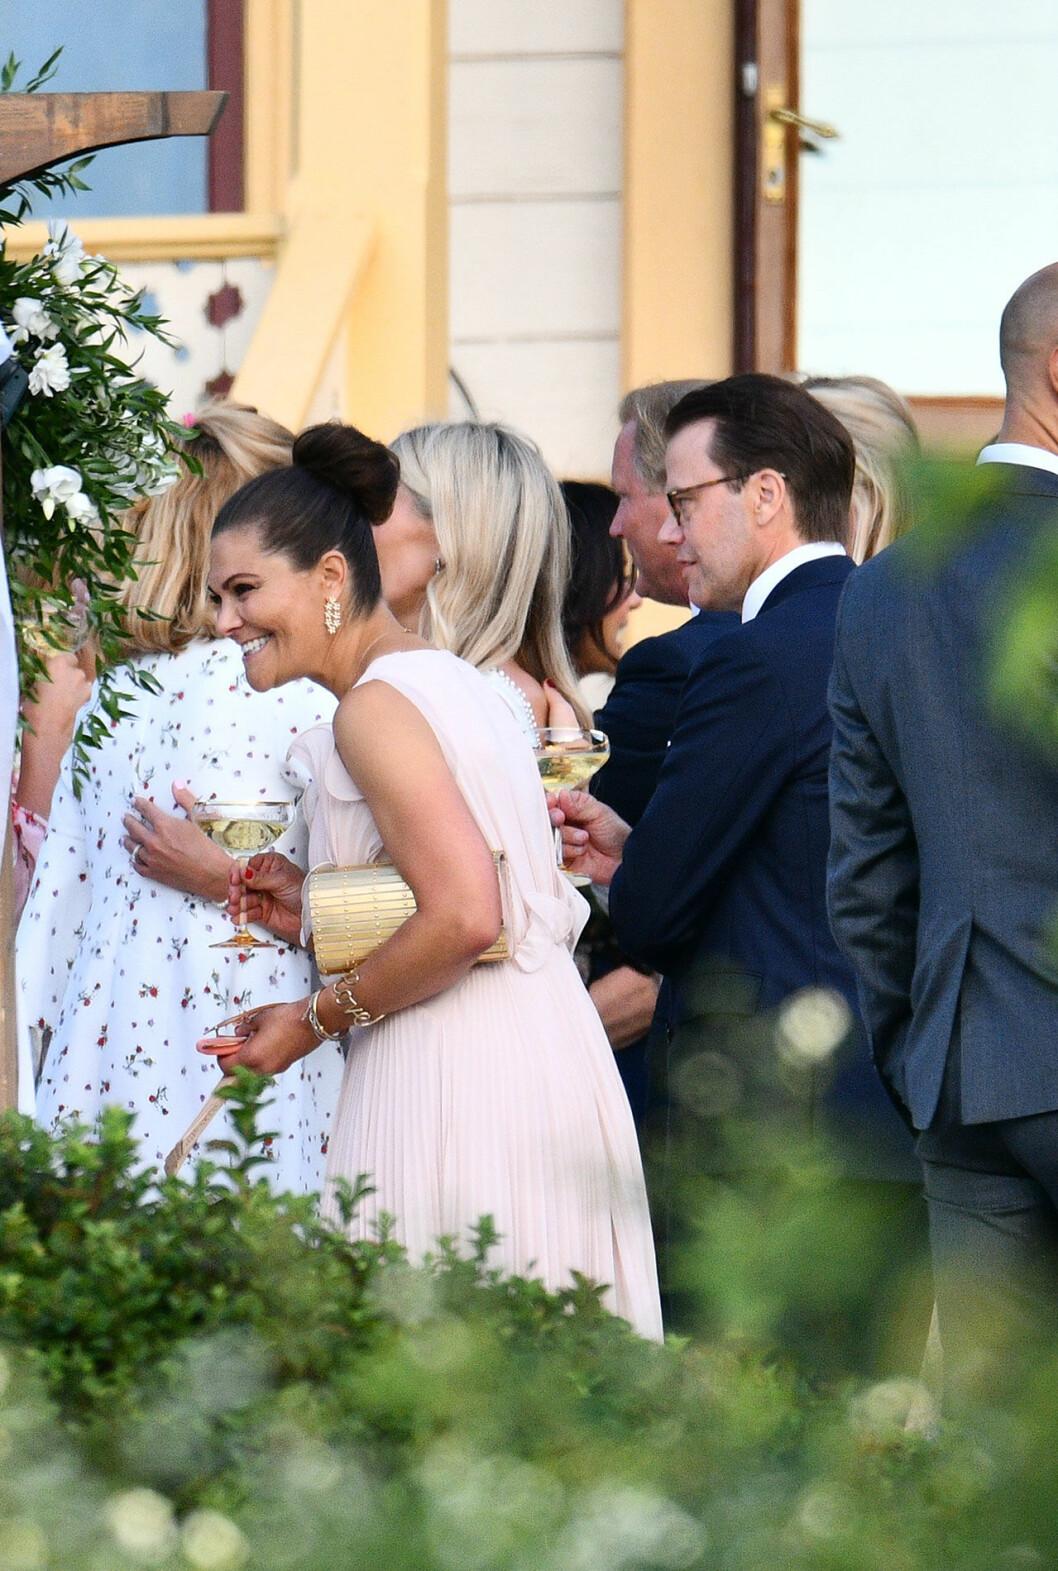 kronprinsessan victoria prins daniel andrea brodins bröllop